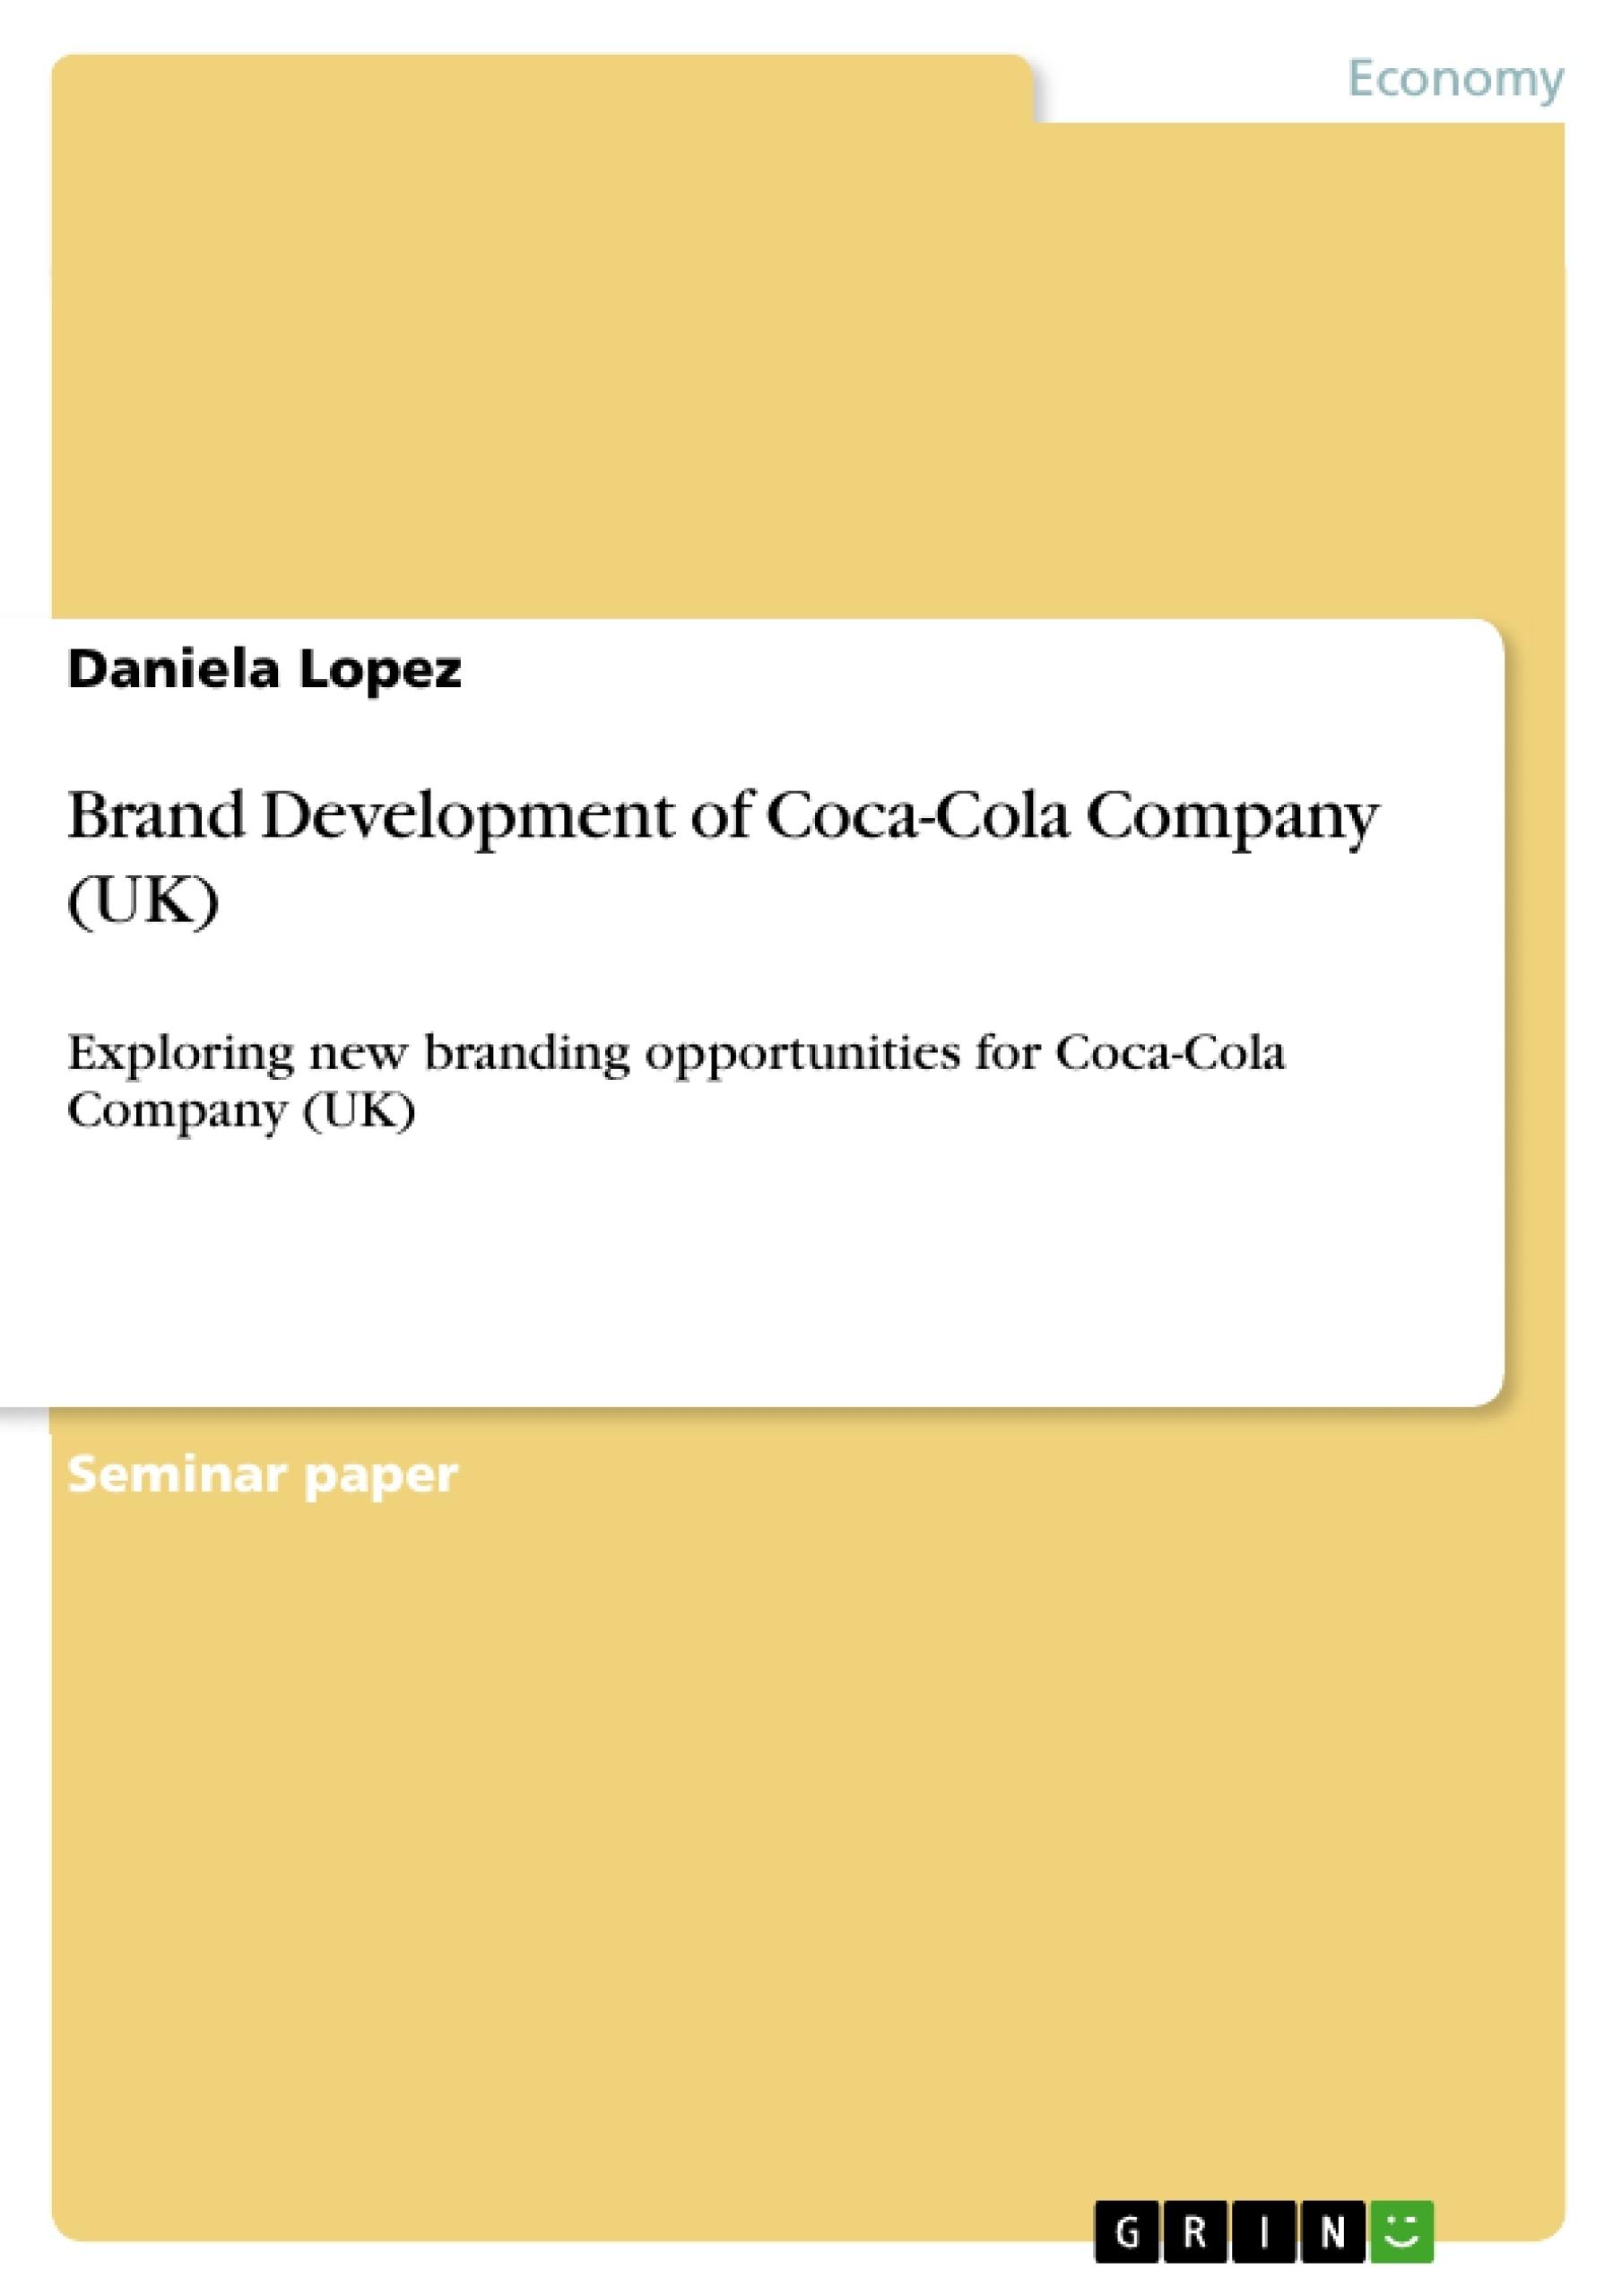 Title: Brand Development of Coca-Cola Company (UK)